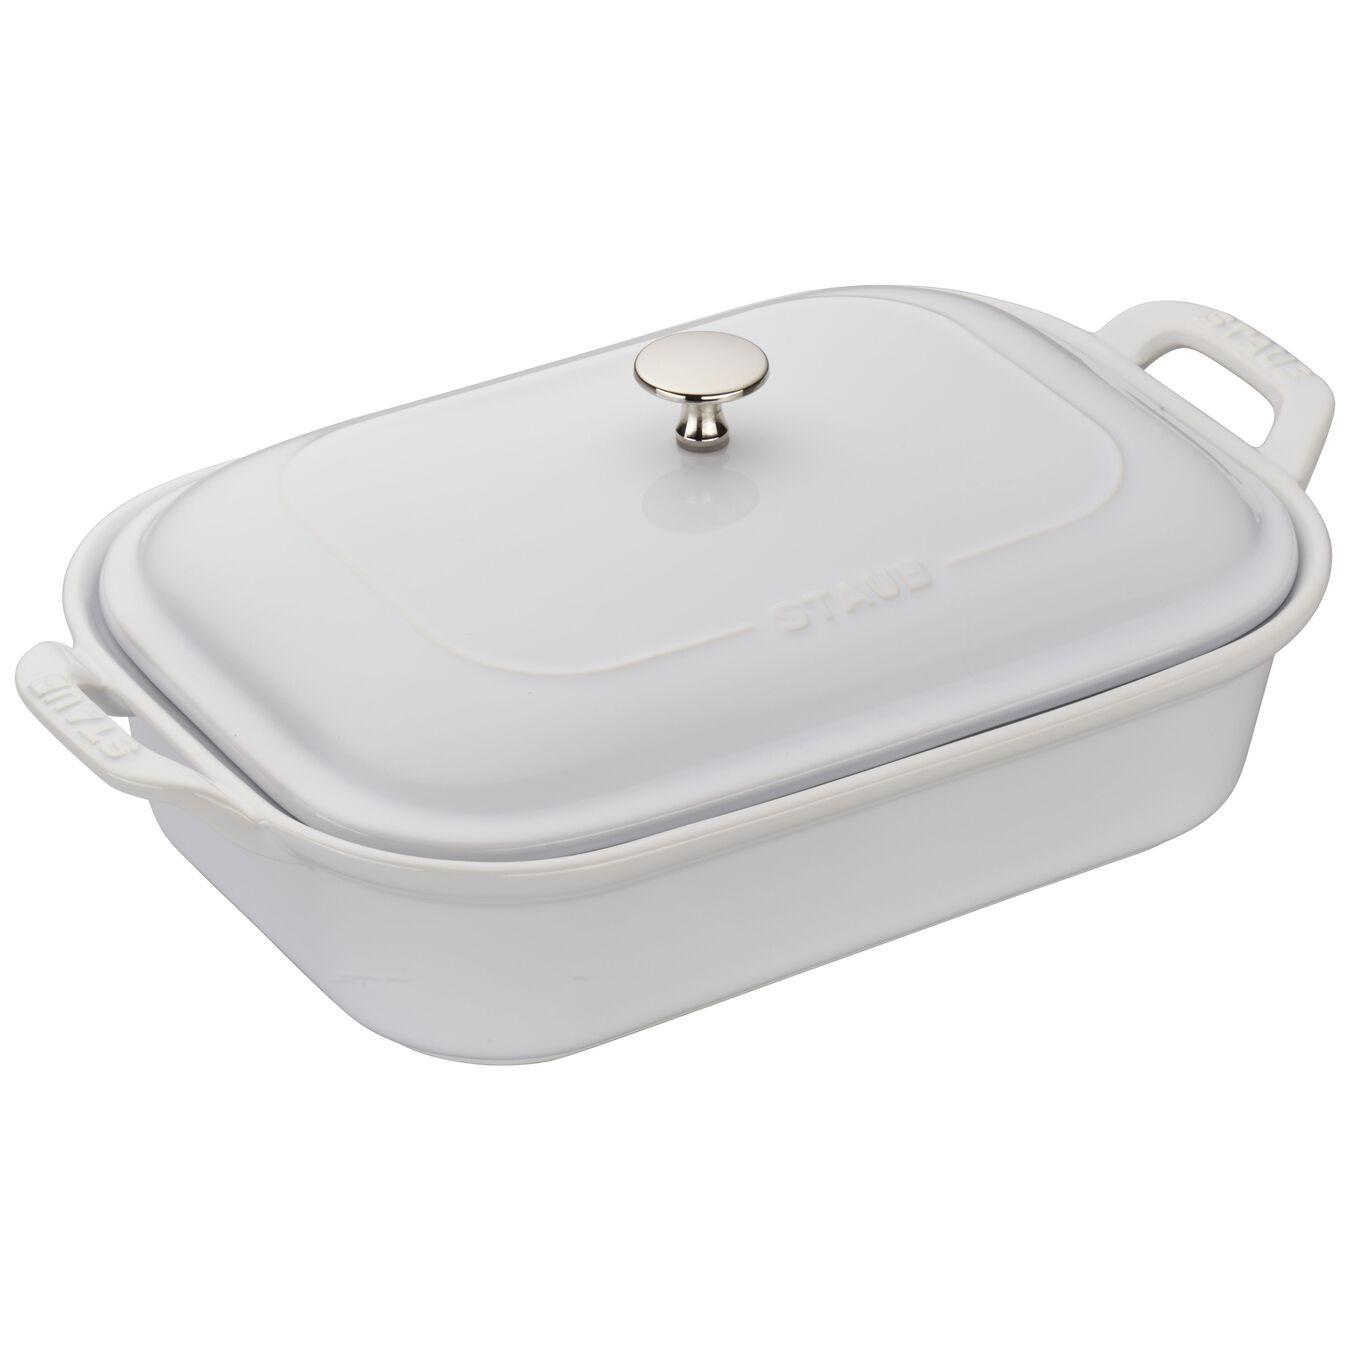 12-inch x 8-inch Rectangular Covered Baking Dish - White,,large 1